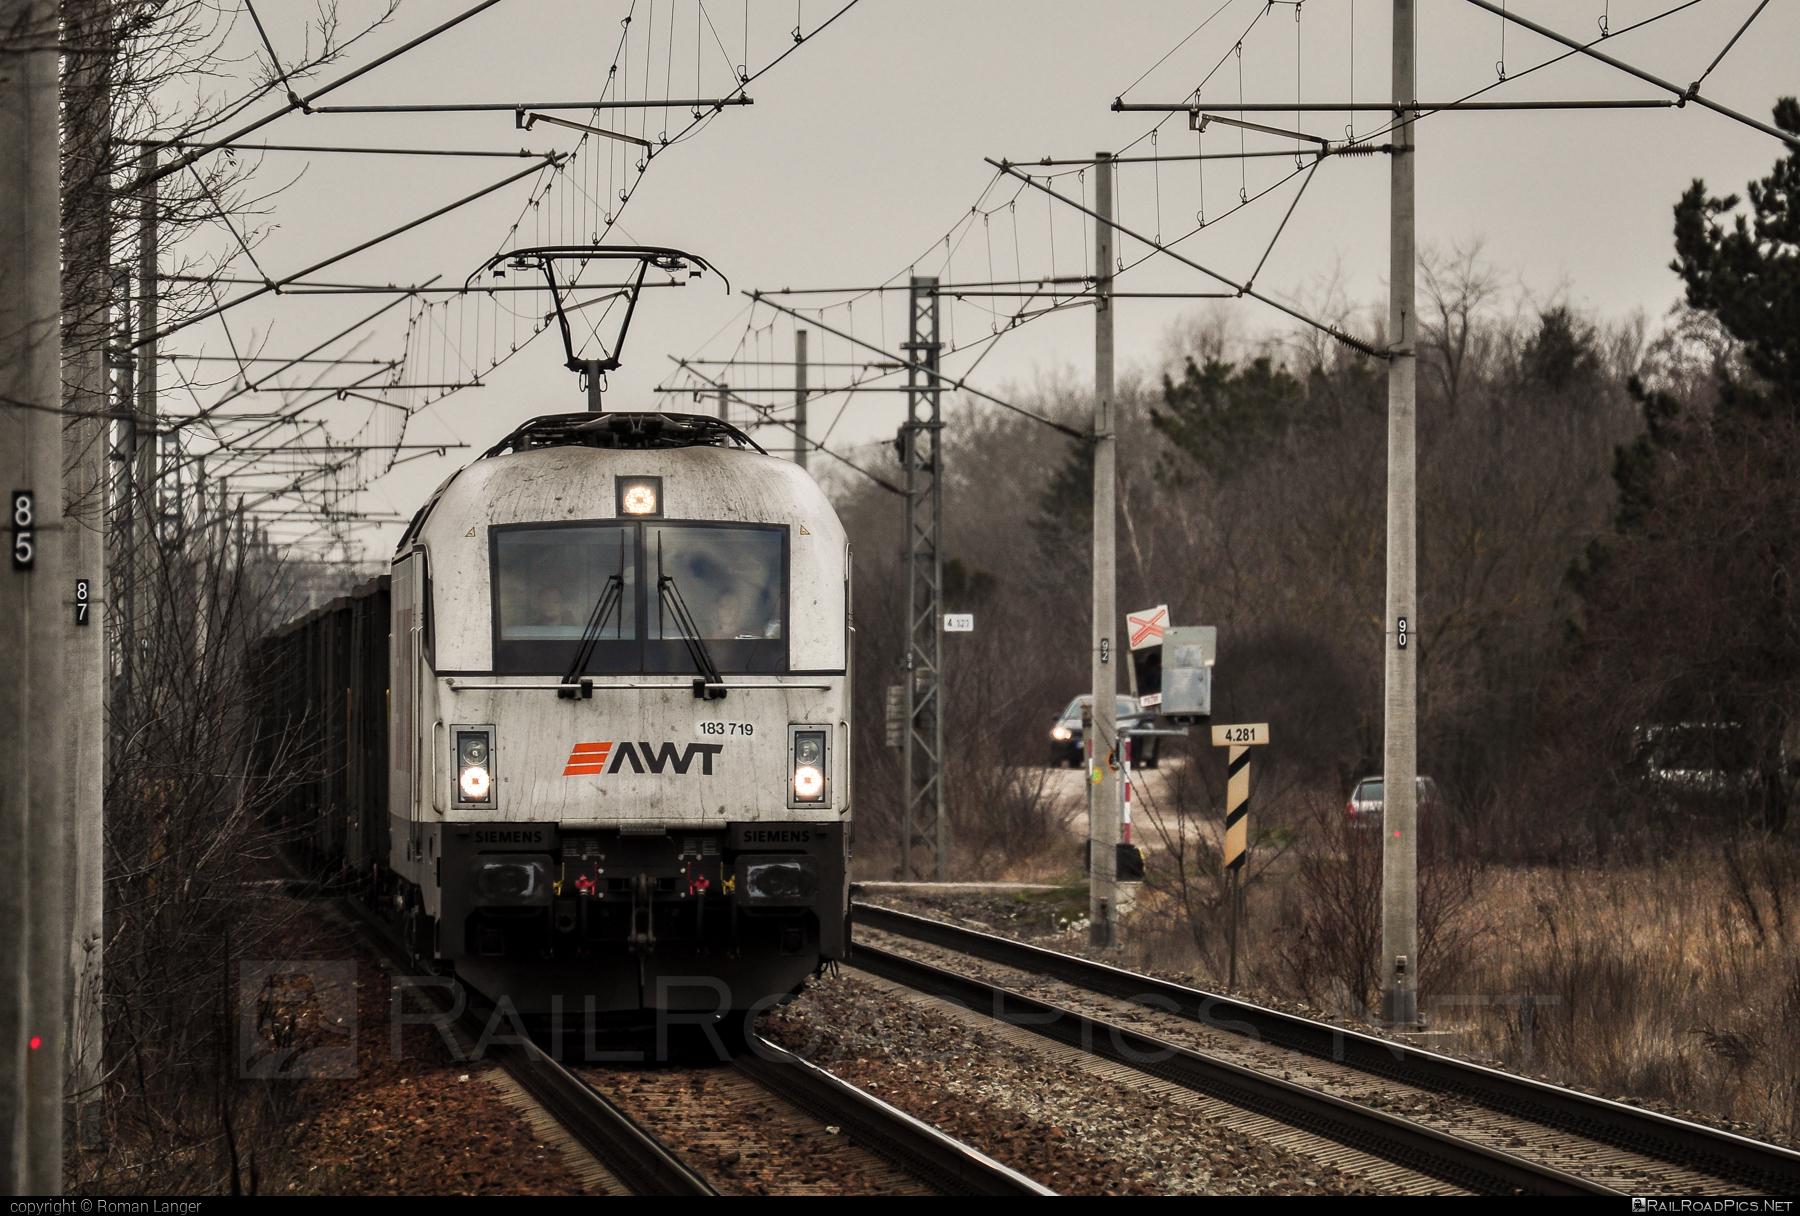 Siemens ES 64 U4 - 183 719 operated by PKP CARGO INTERNATIONAL a.s. #awt #es64 #es64u #es64u4 #eurosprinter #pkpcargointernational #pkpcargointernationalas #siemens #siemenses64 #siemenses64u #siemenses64u4 #siemenstaurus #taurus #tauruslocomotive